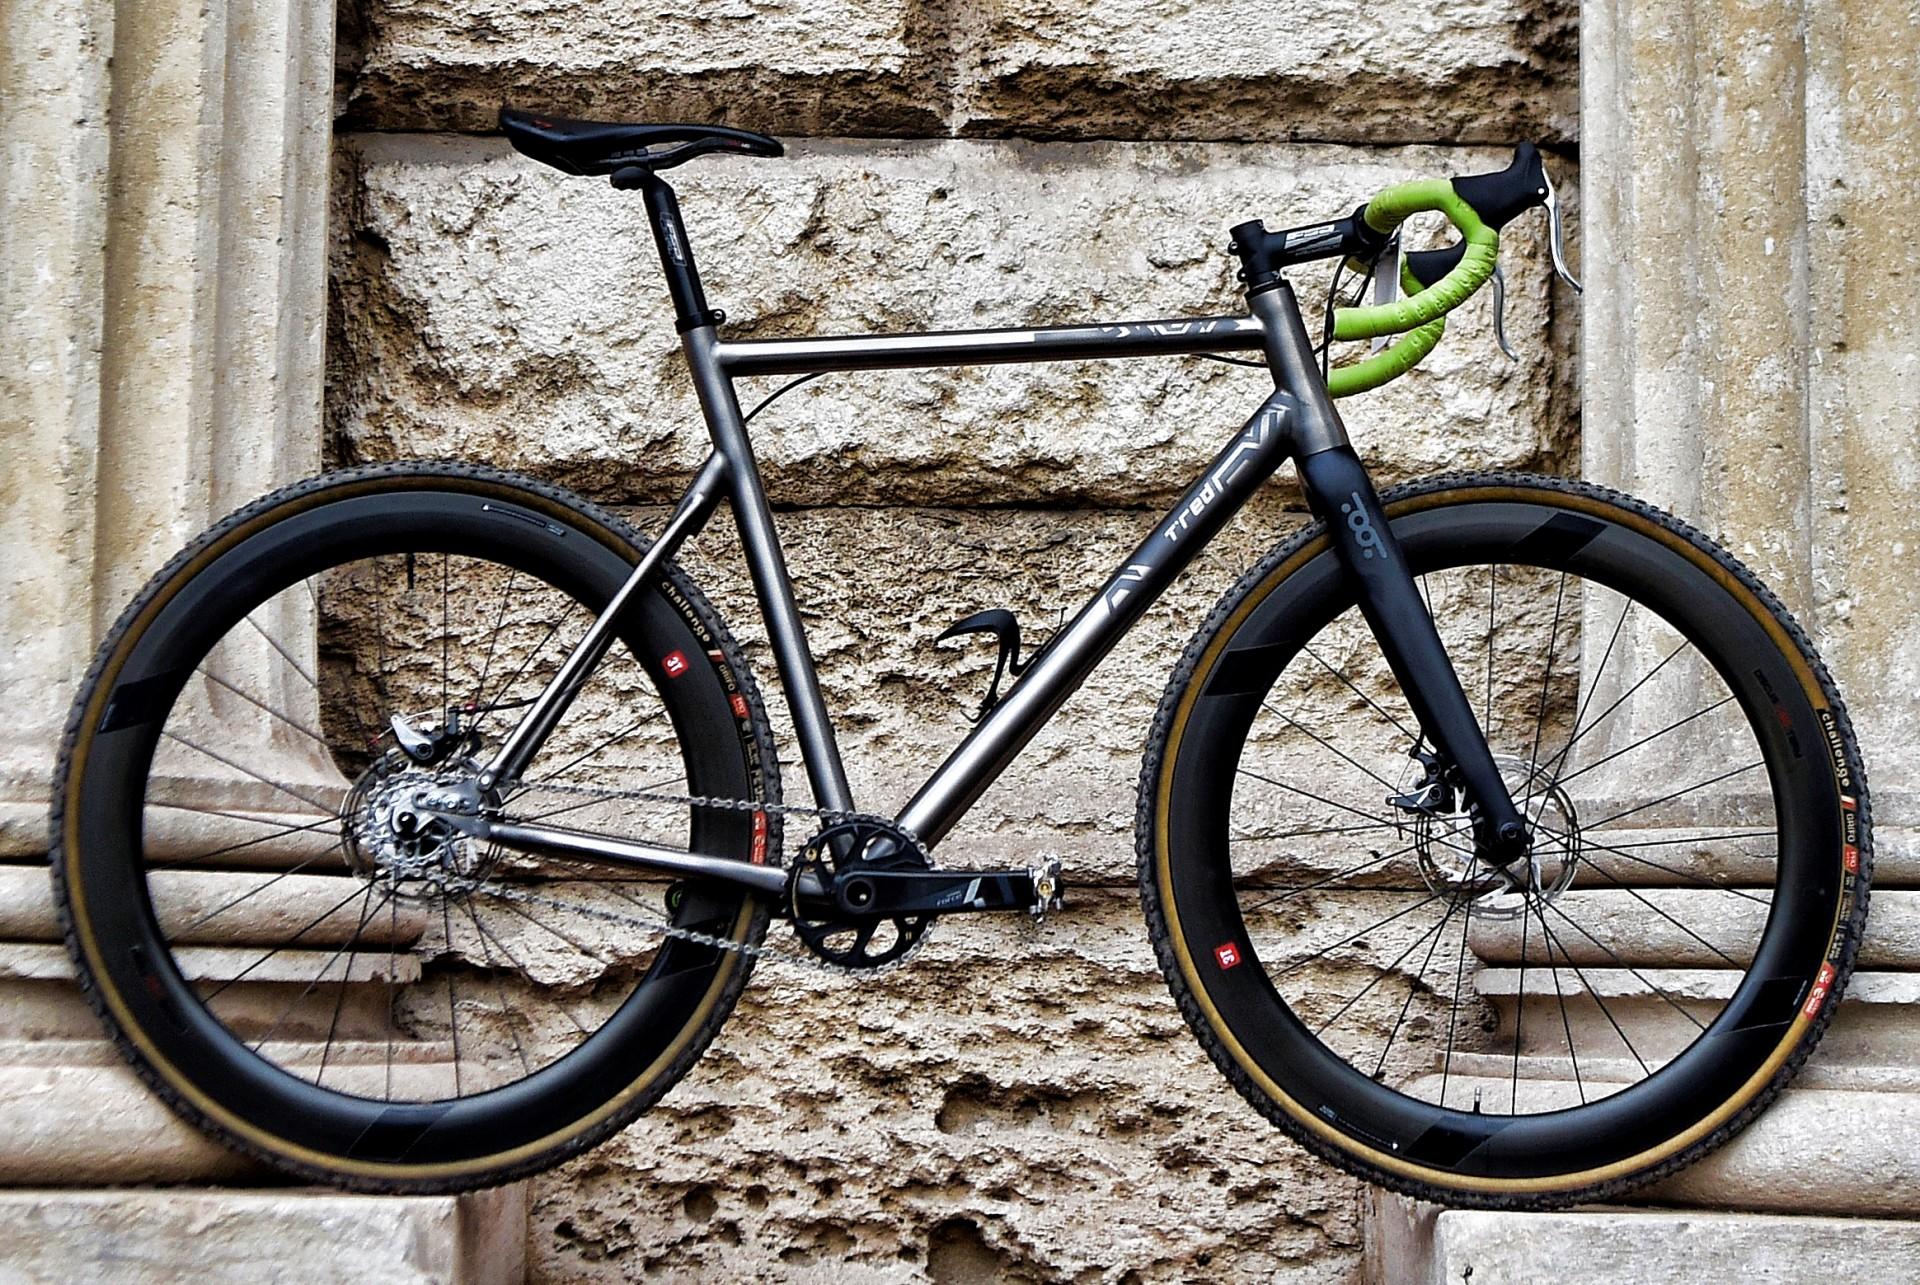 bici da ciclocross T°Red Camobeast titanio single speed, vista statica laterale destra